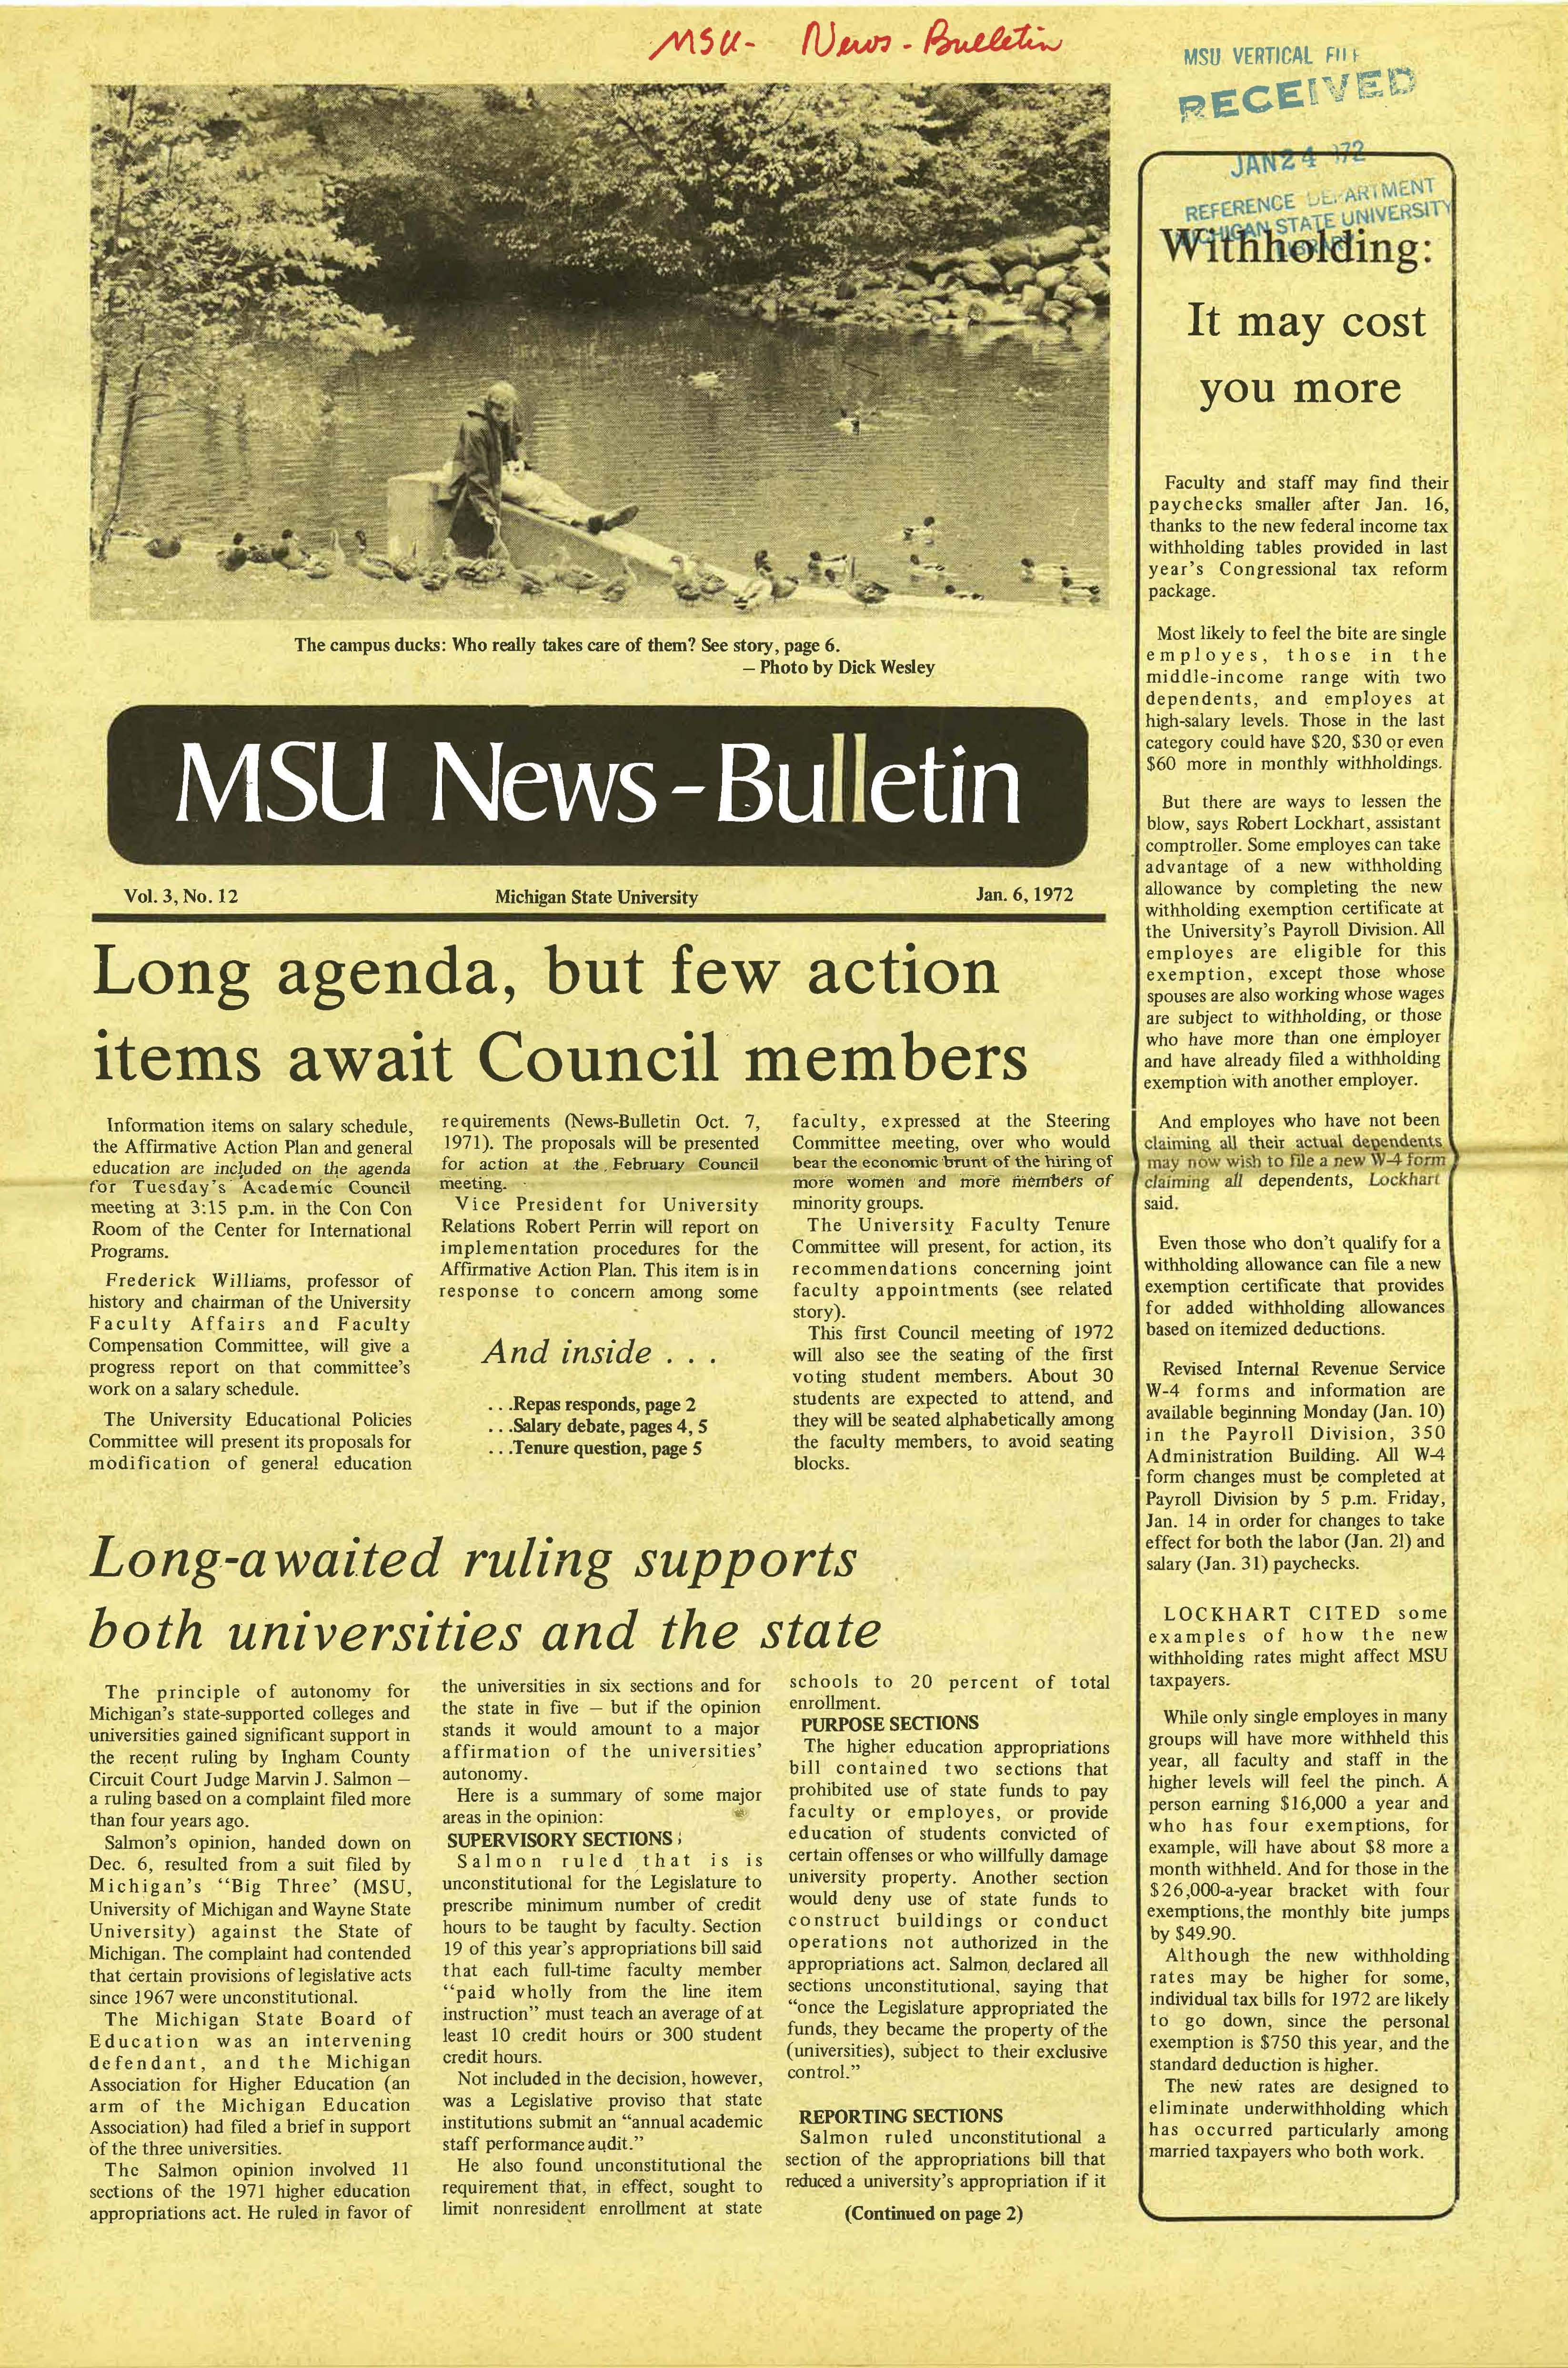 MSU News Bulletin, vol. 4, No. 10, November 22, 1972